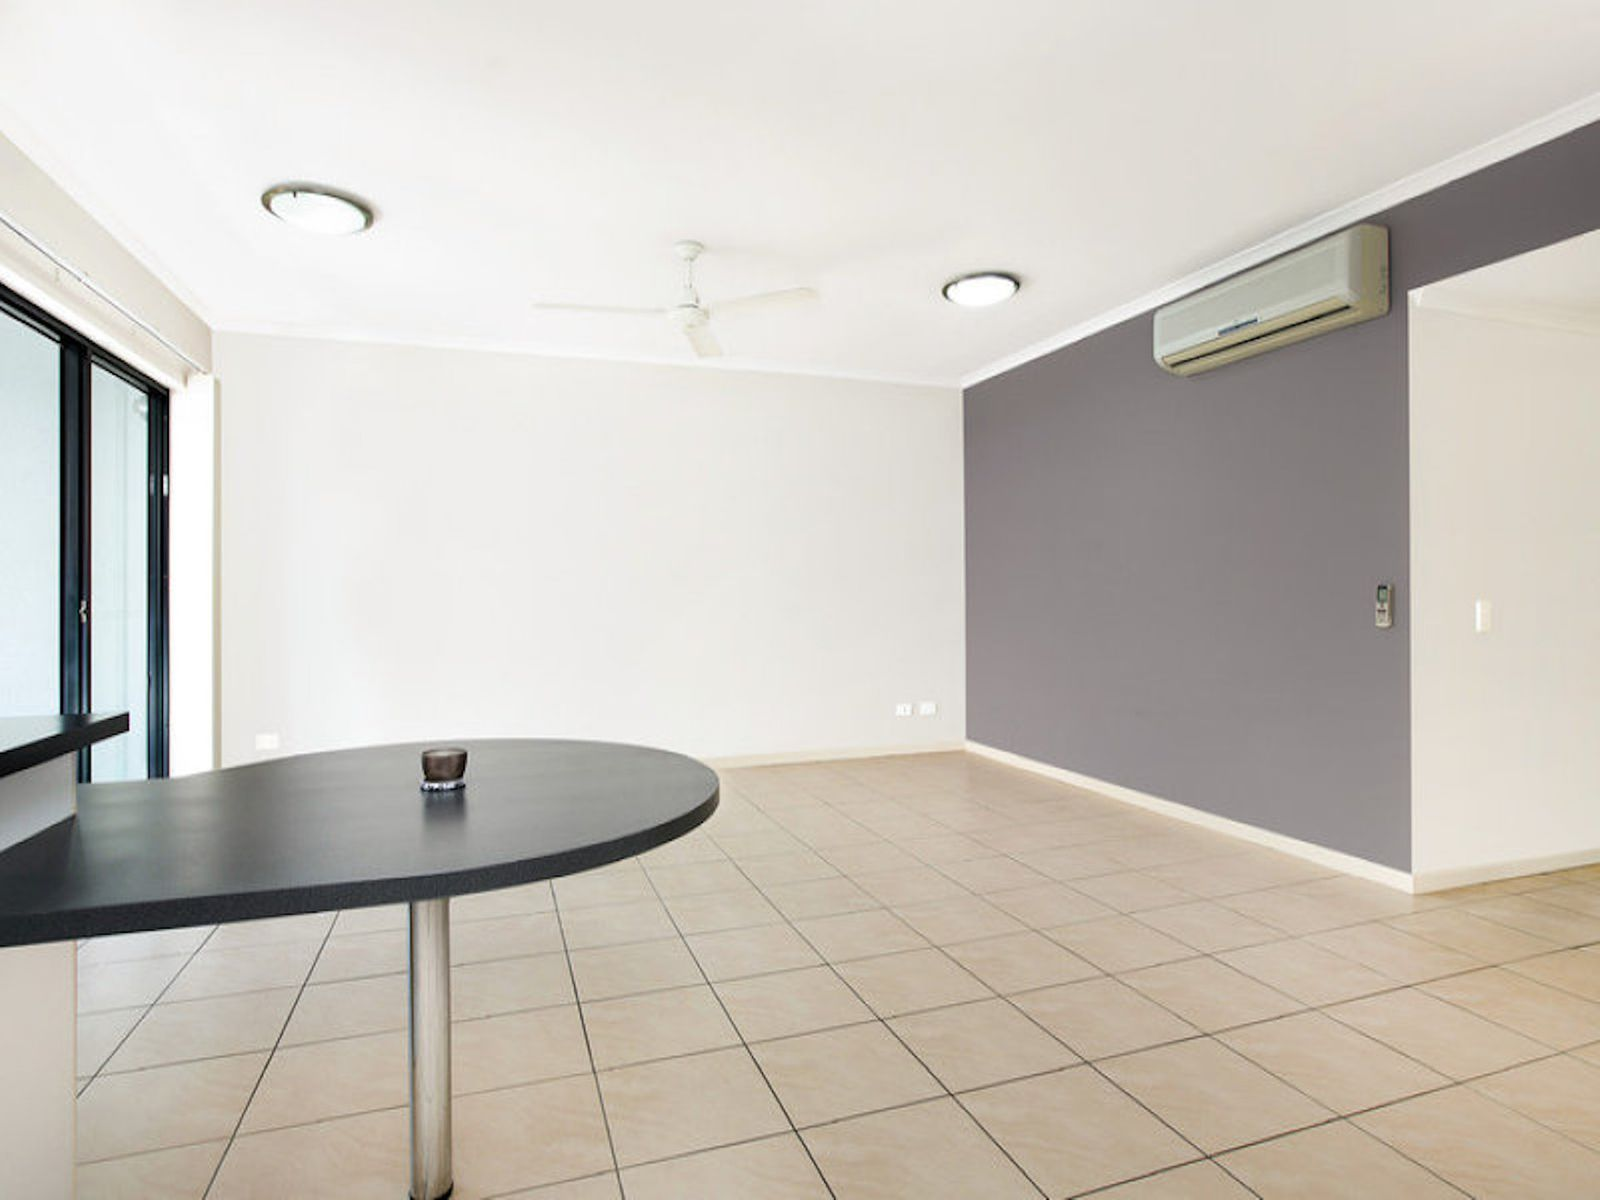 9/157 Martyn Street, Parramatta Park, QLD 4870